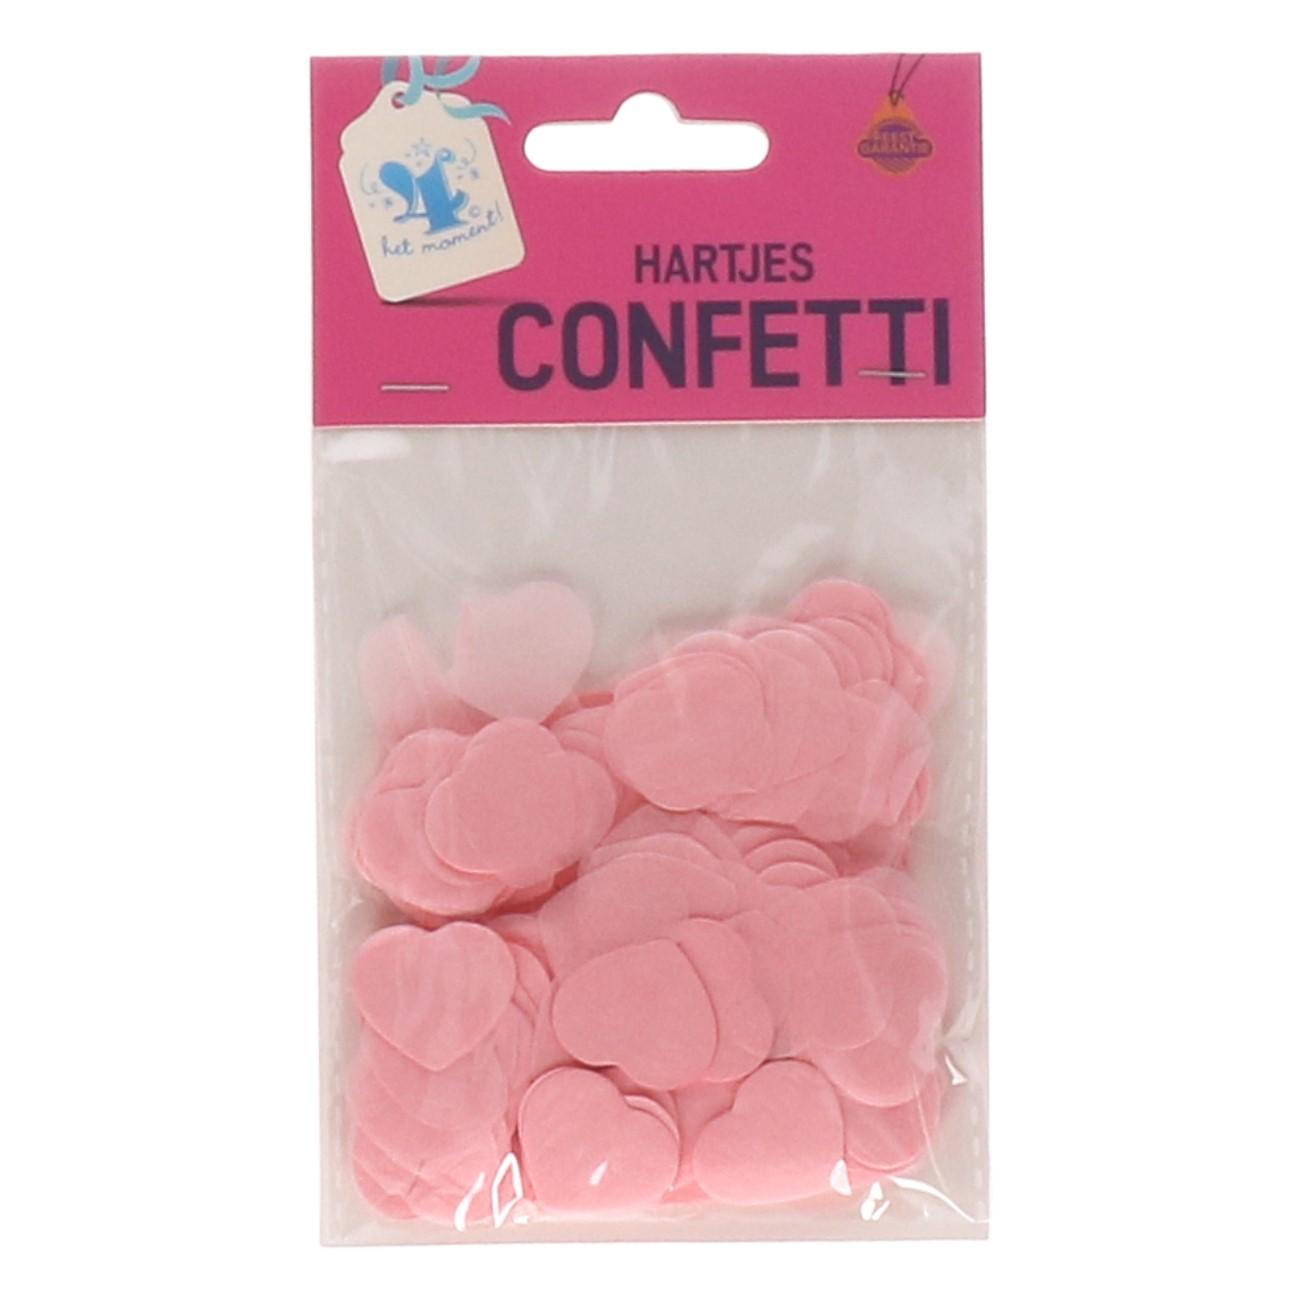 Confetti hartjes roze